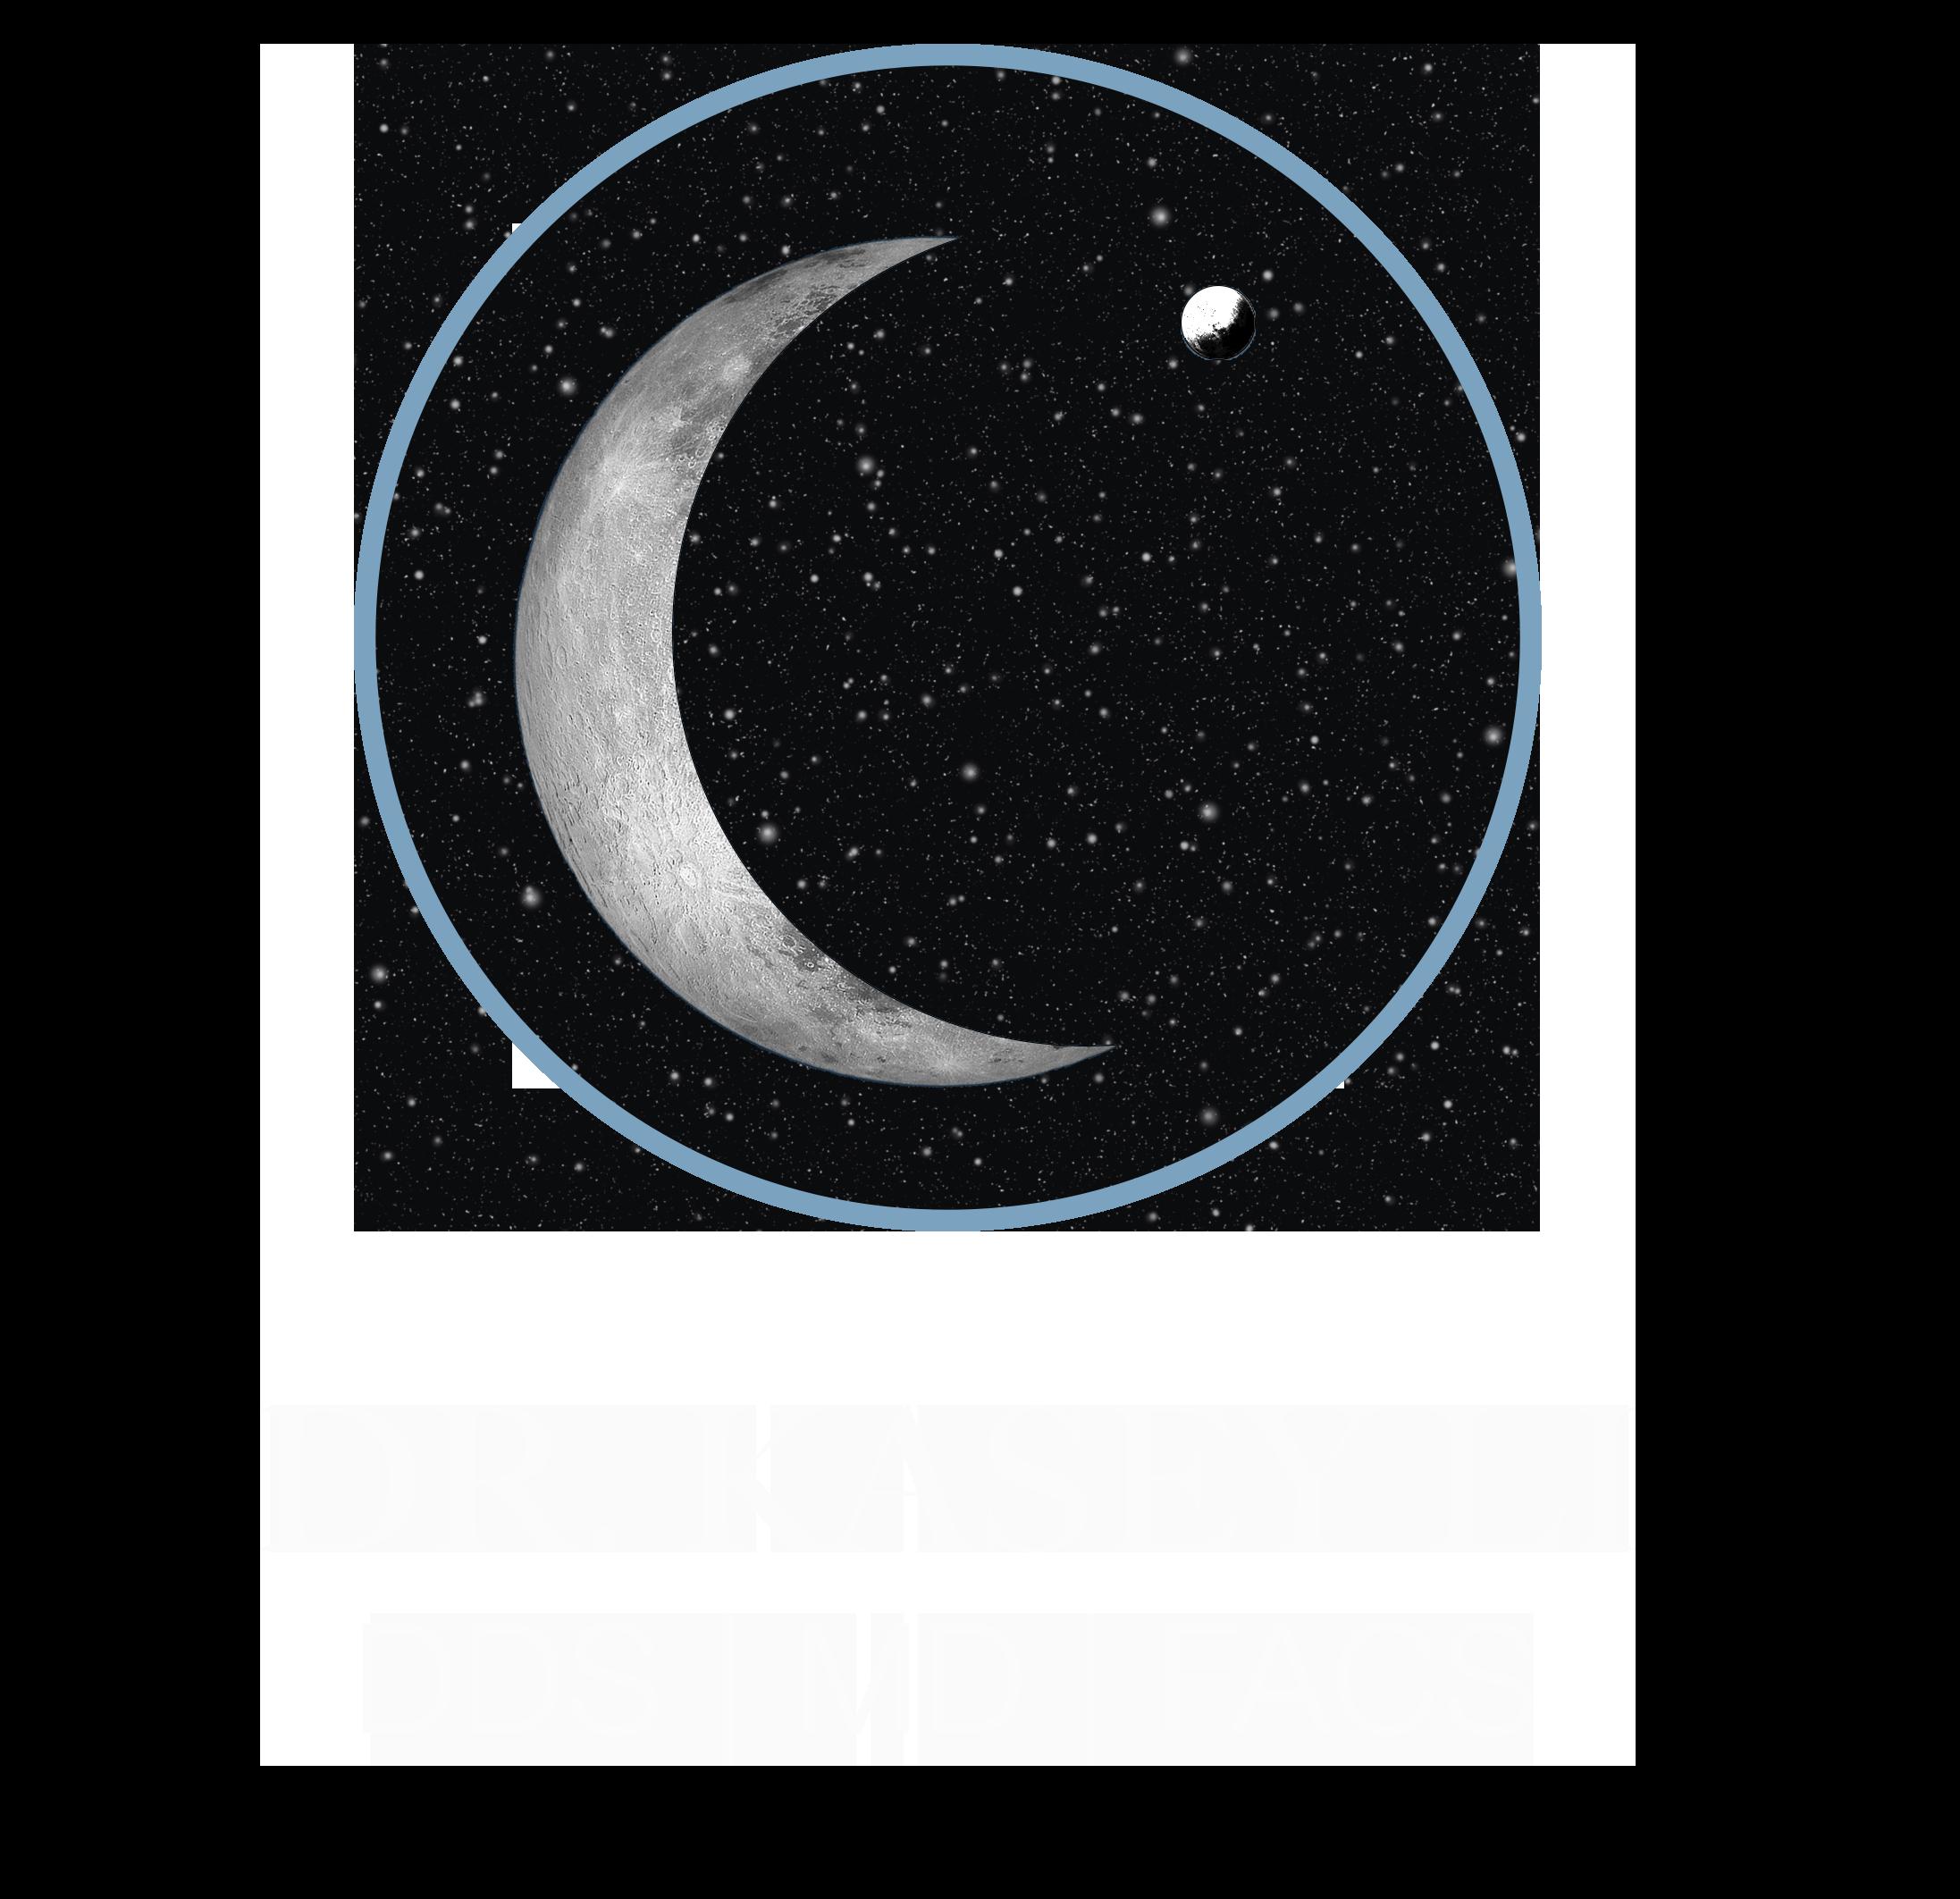 Dr. Kasey Li